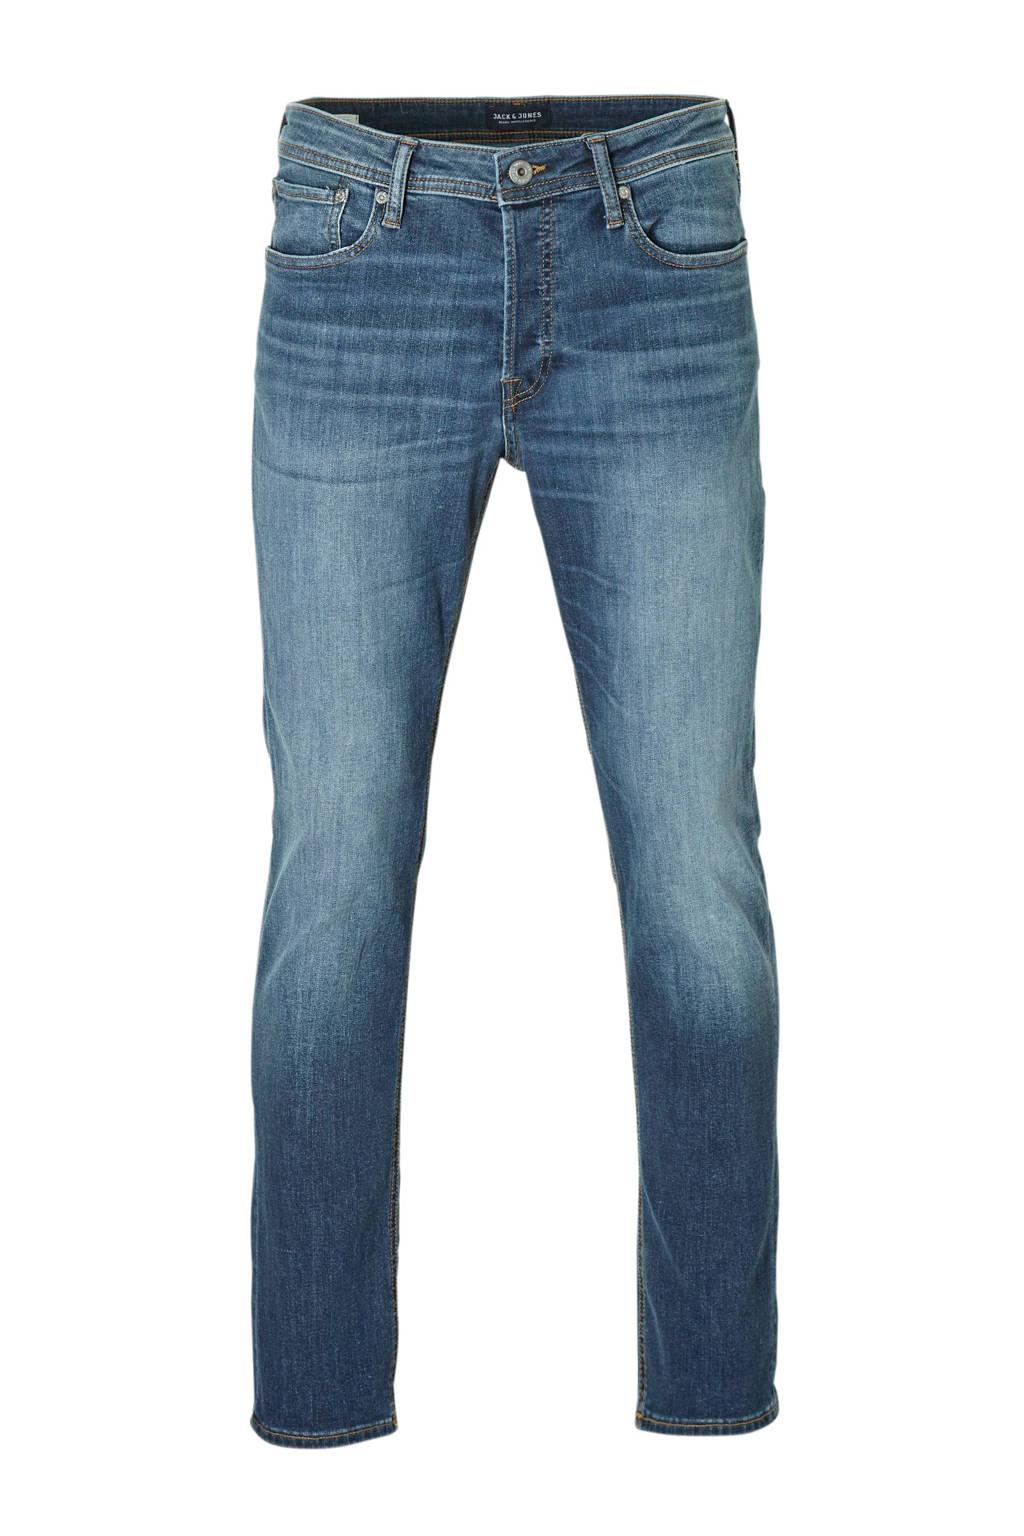 Jack & Jones Originals slim fit jeans Tim, Blauw